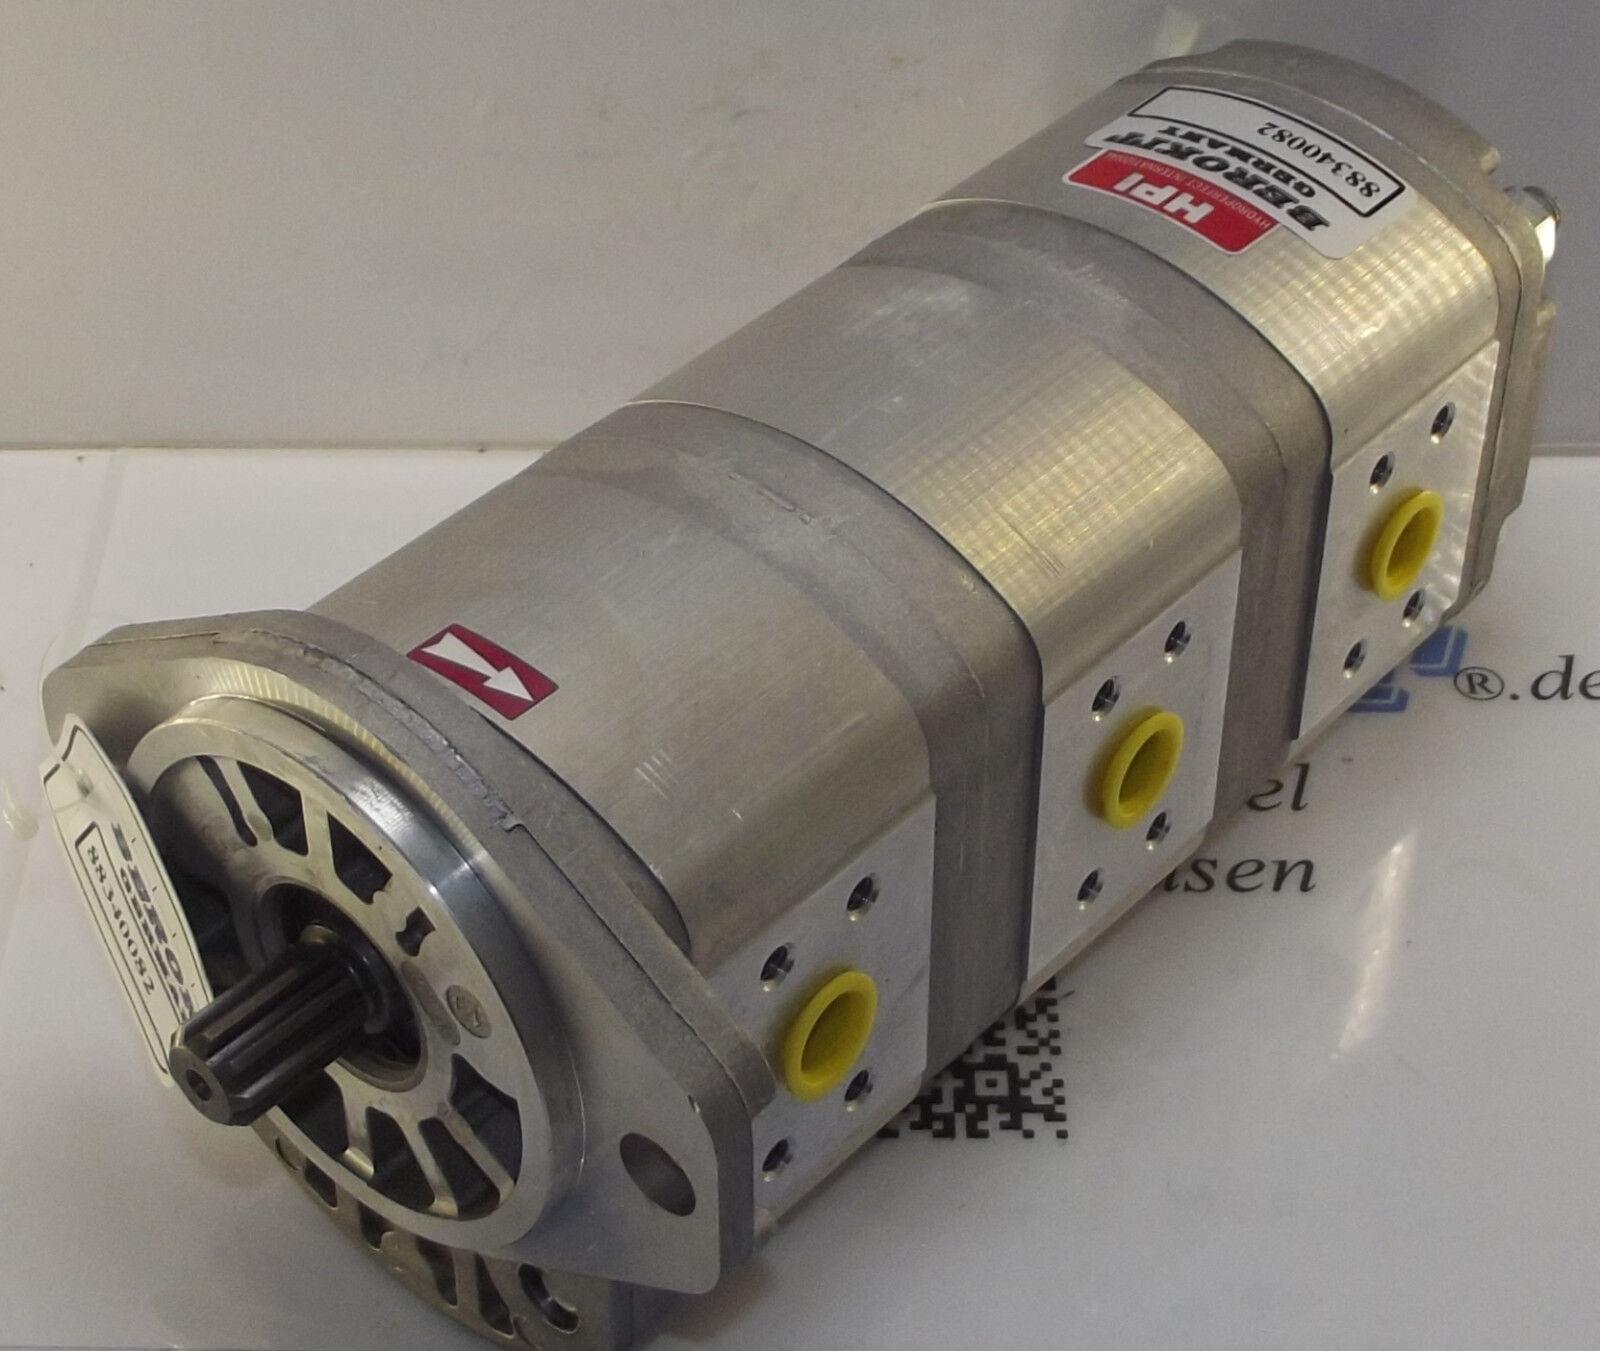 PEL JOB EB12 EB16 EB22 EB22.4 Bobcat X125 Hydraulikpumpe E5350009 ...